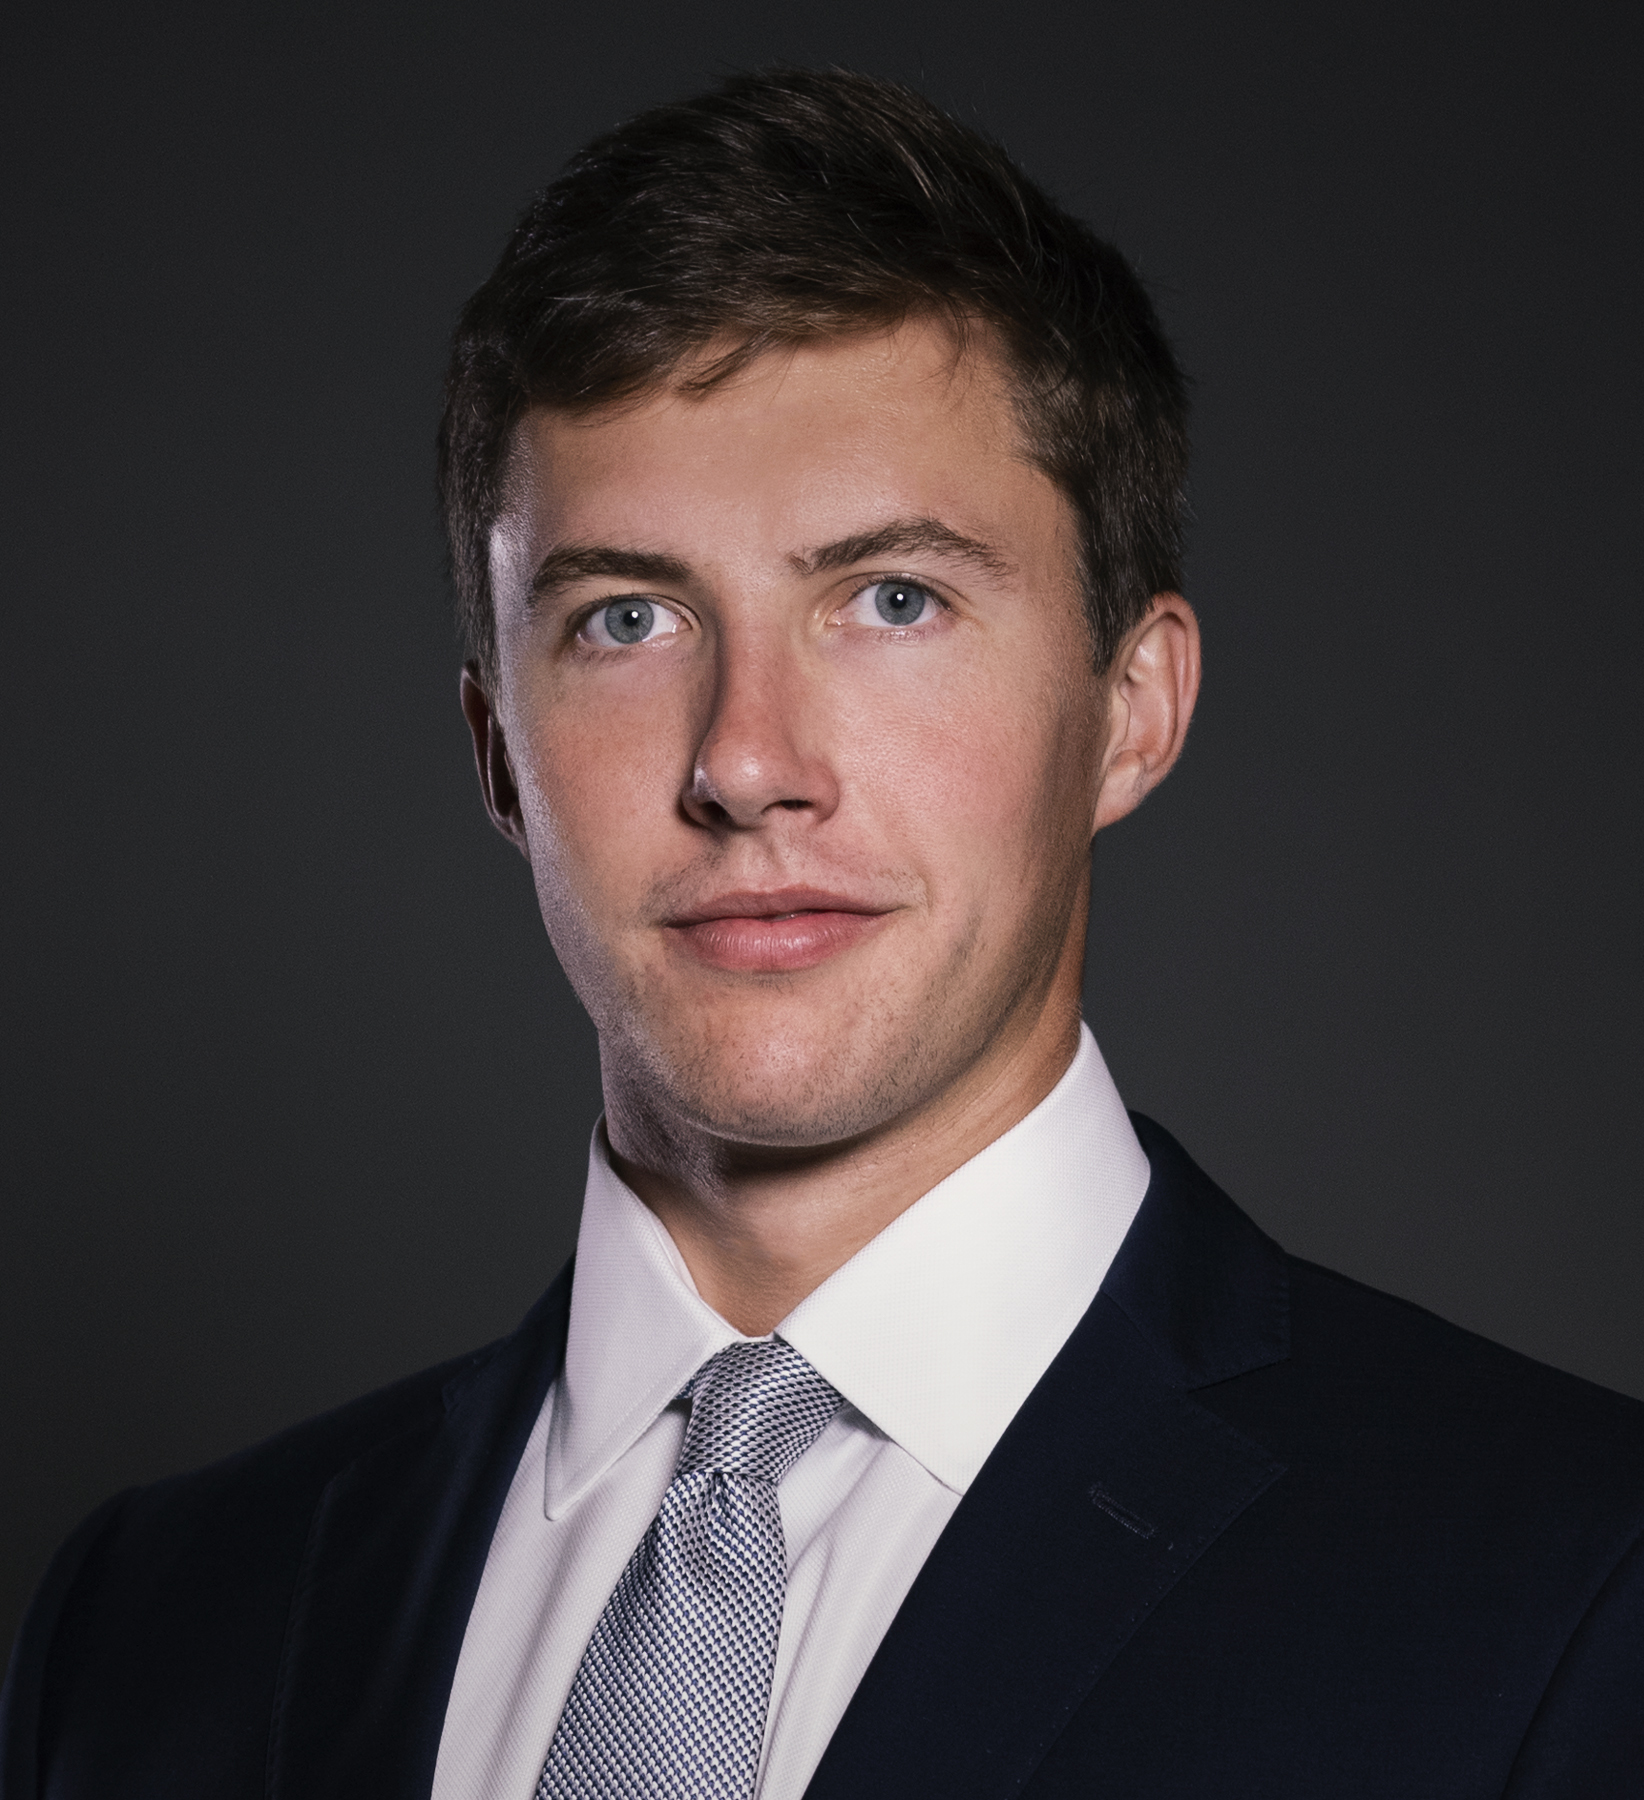 Jack Miller Headshot | Dakota Investments